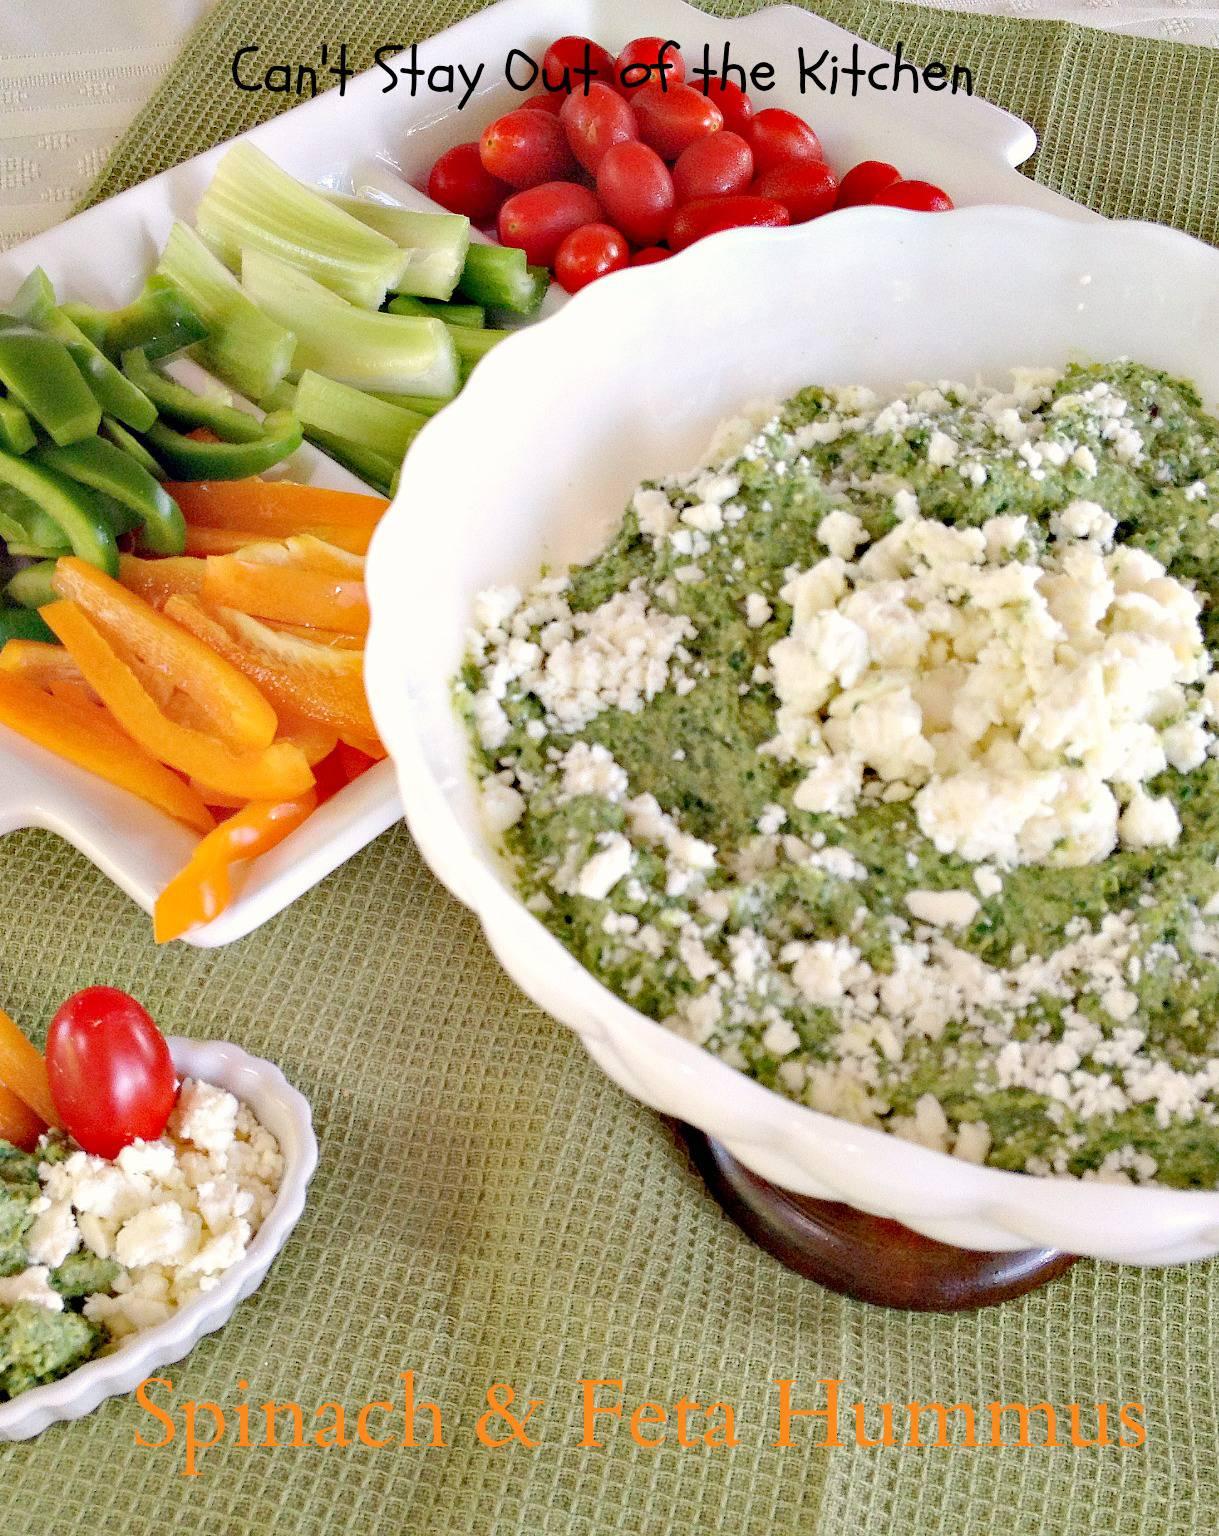 Spinach and Feta Hummus